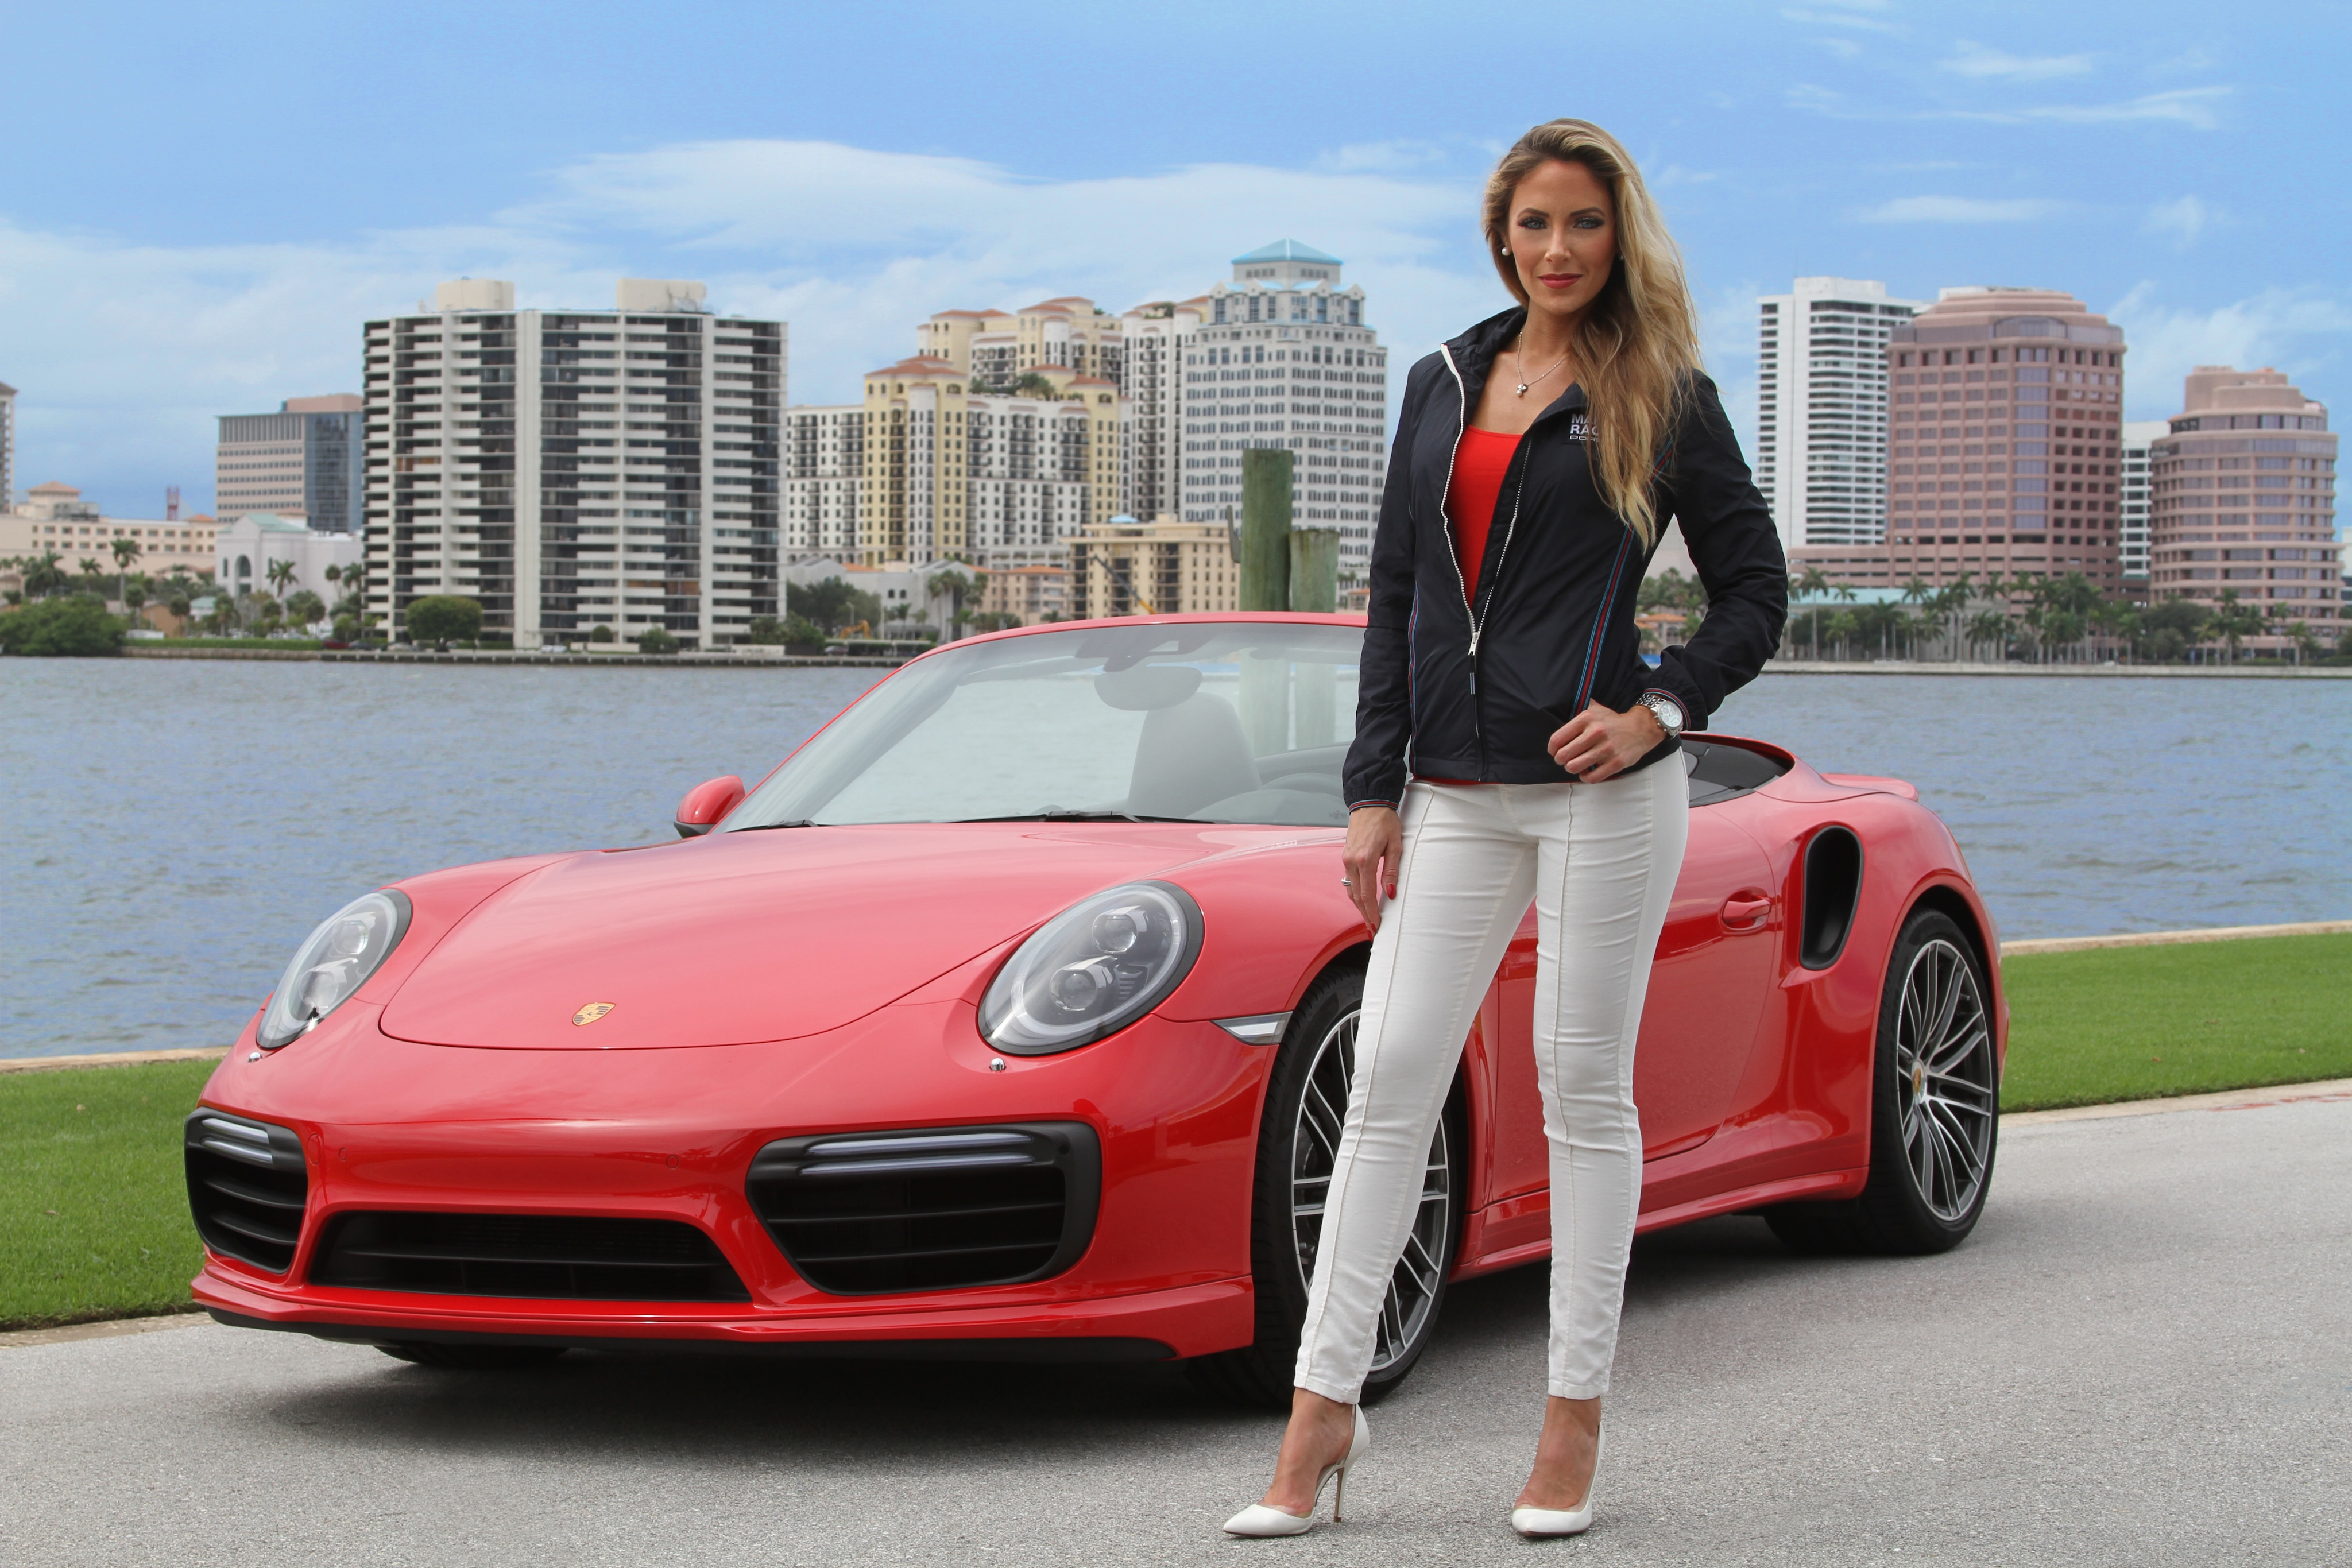 braman rolls royce luxury used cars west palm beach autos post. Black Bedroom Furniture Sets. Home Design Ideas